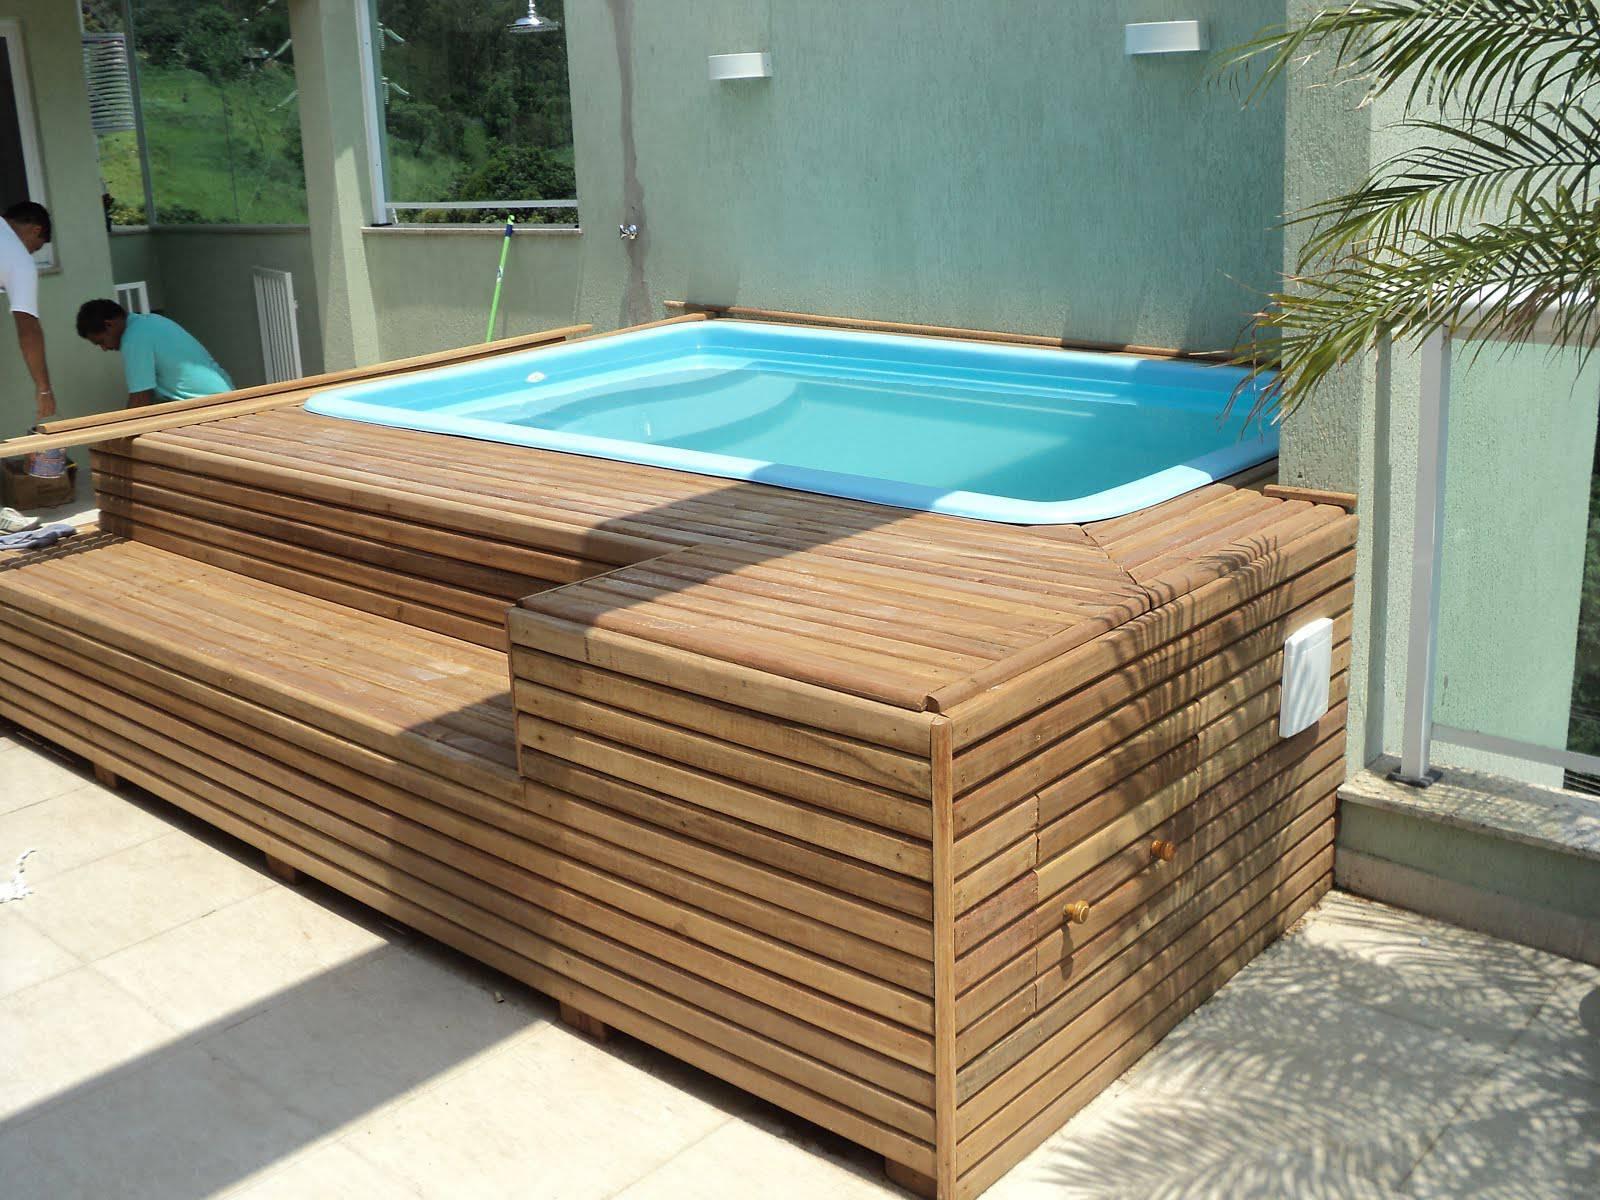 M s de 1000 ideas sobre piscina de fibra pequena en - Piscinas de fibra ...